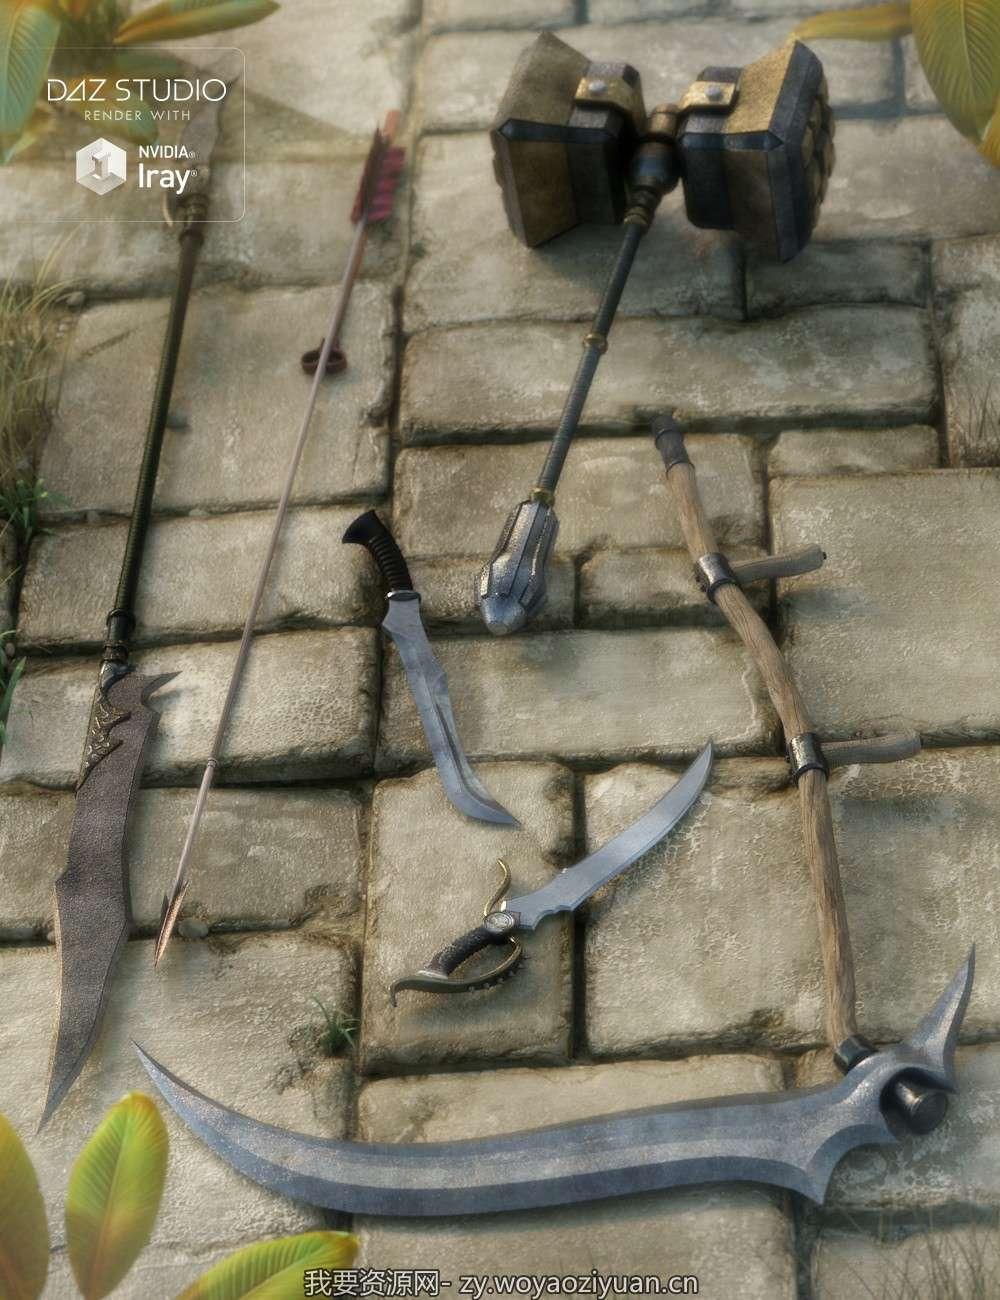 Dark Fantasy Weapons